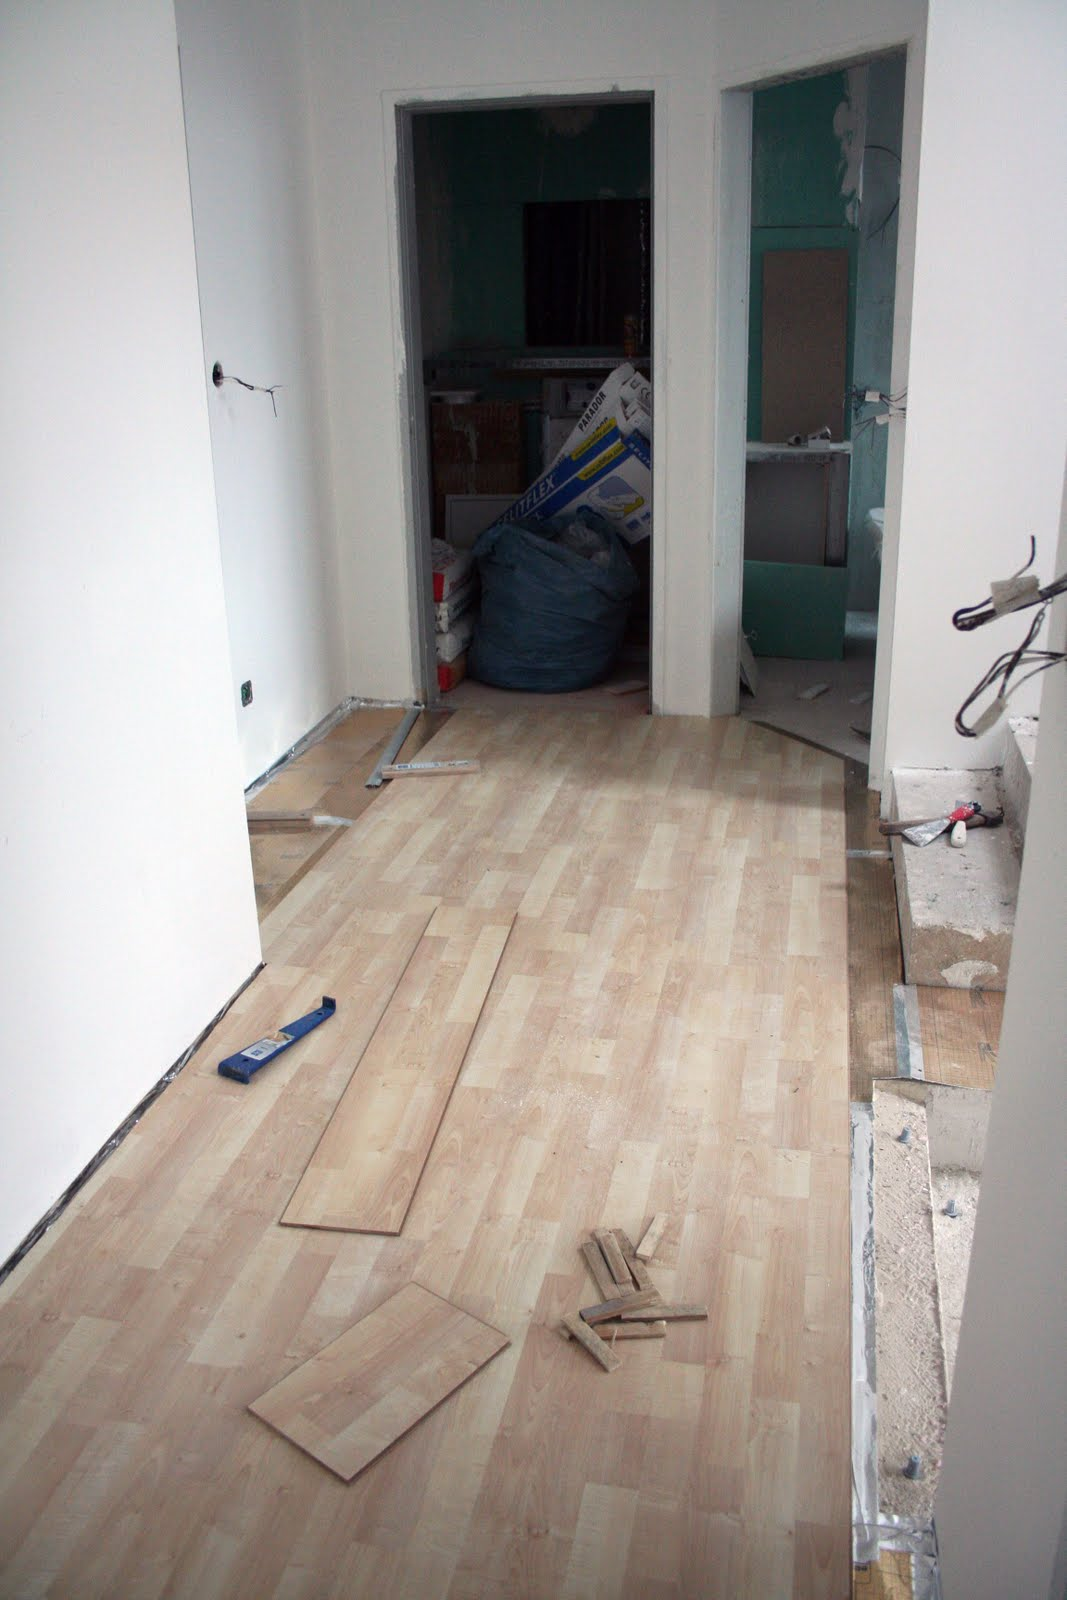 Zieglers bauen Haus: Februar 2011